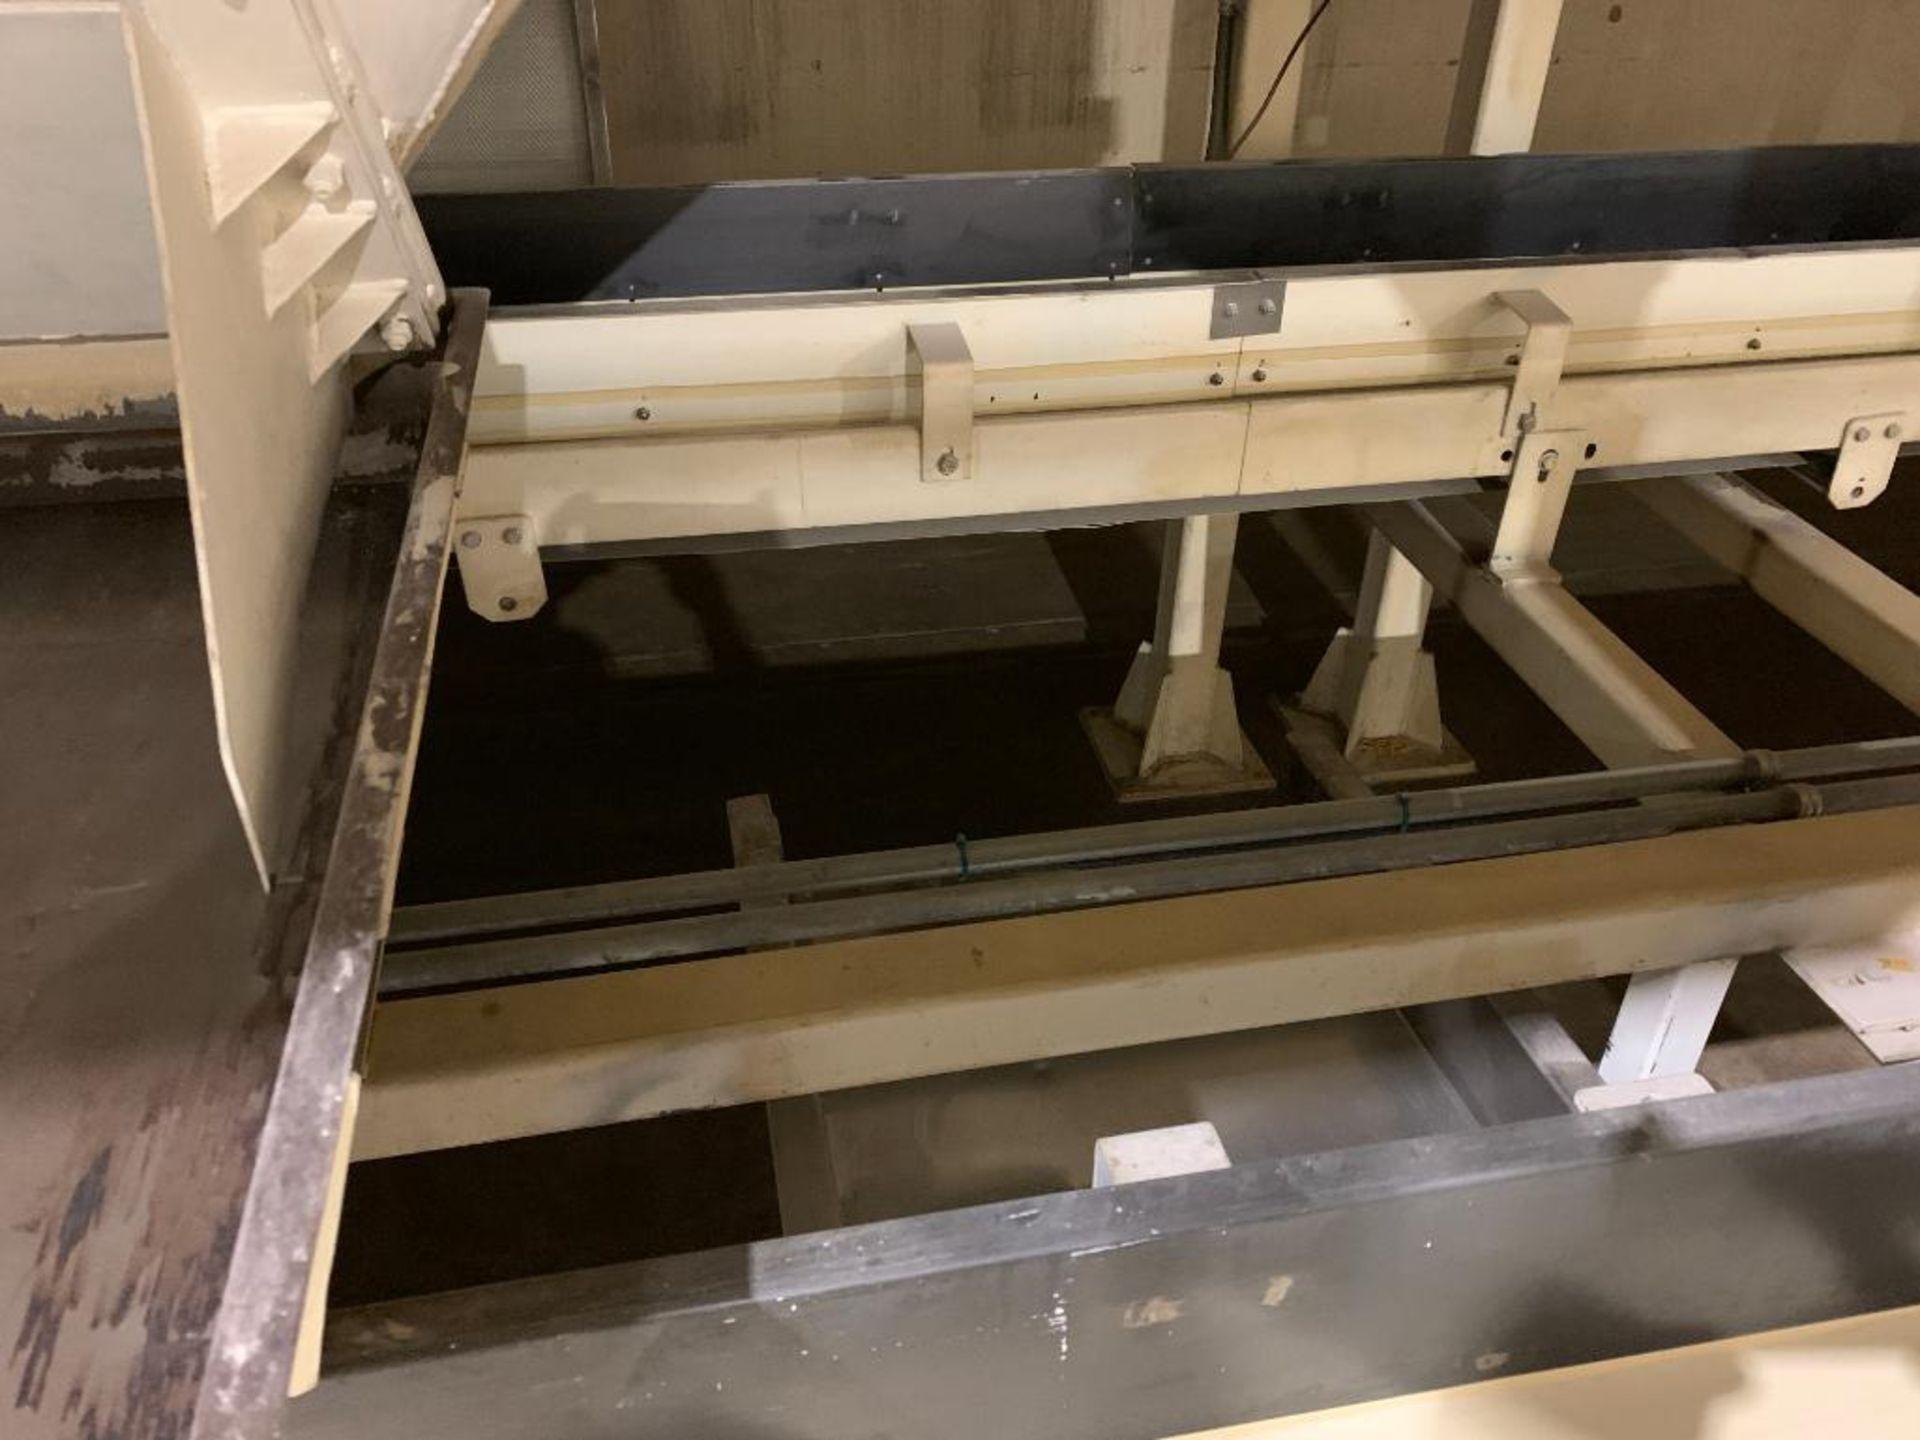 Aseeco mild steel cone bottom bulk storage bin - Image 16 of 23